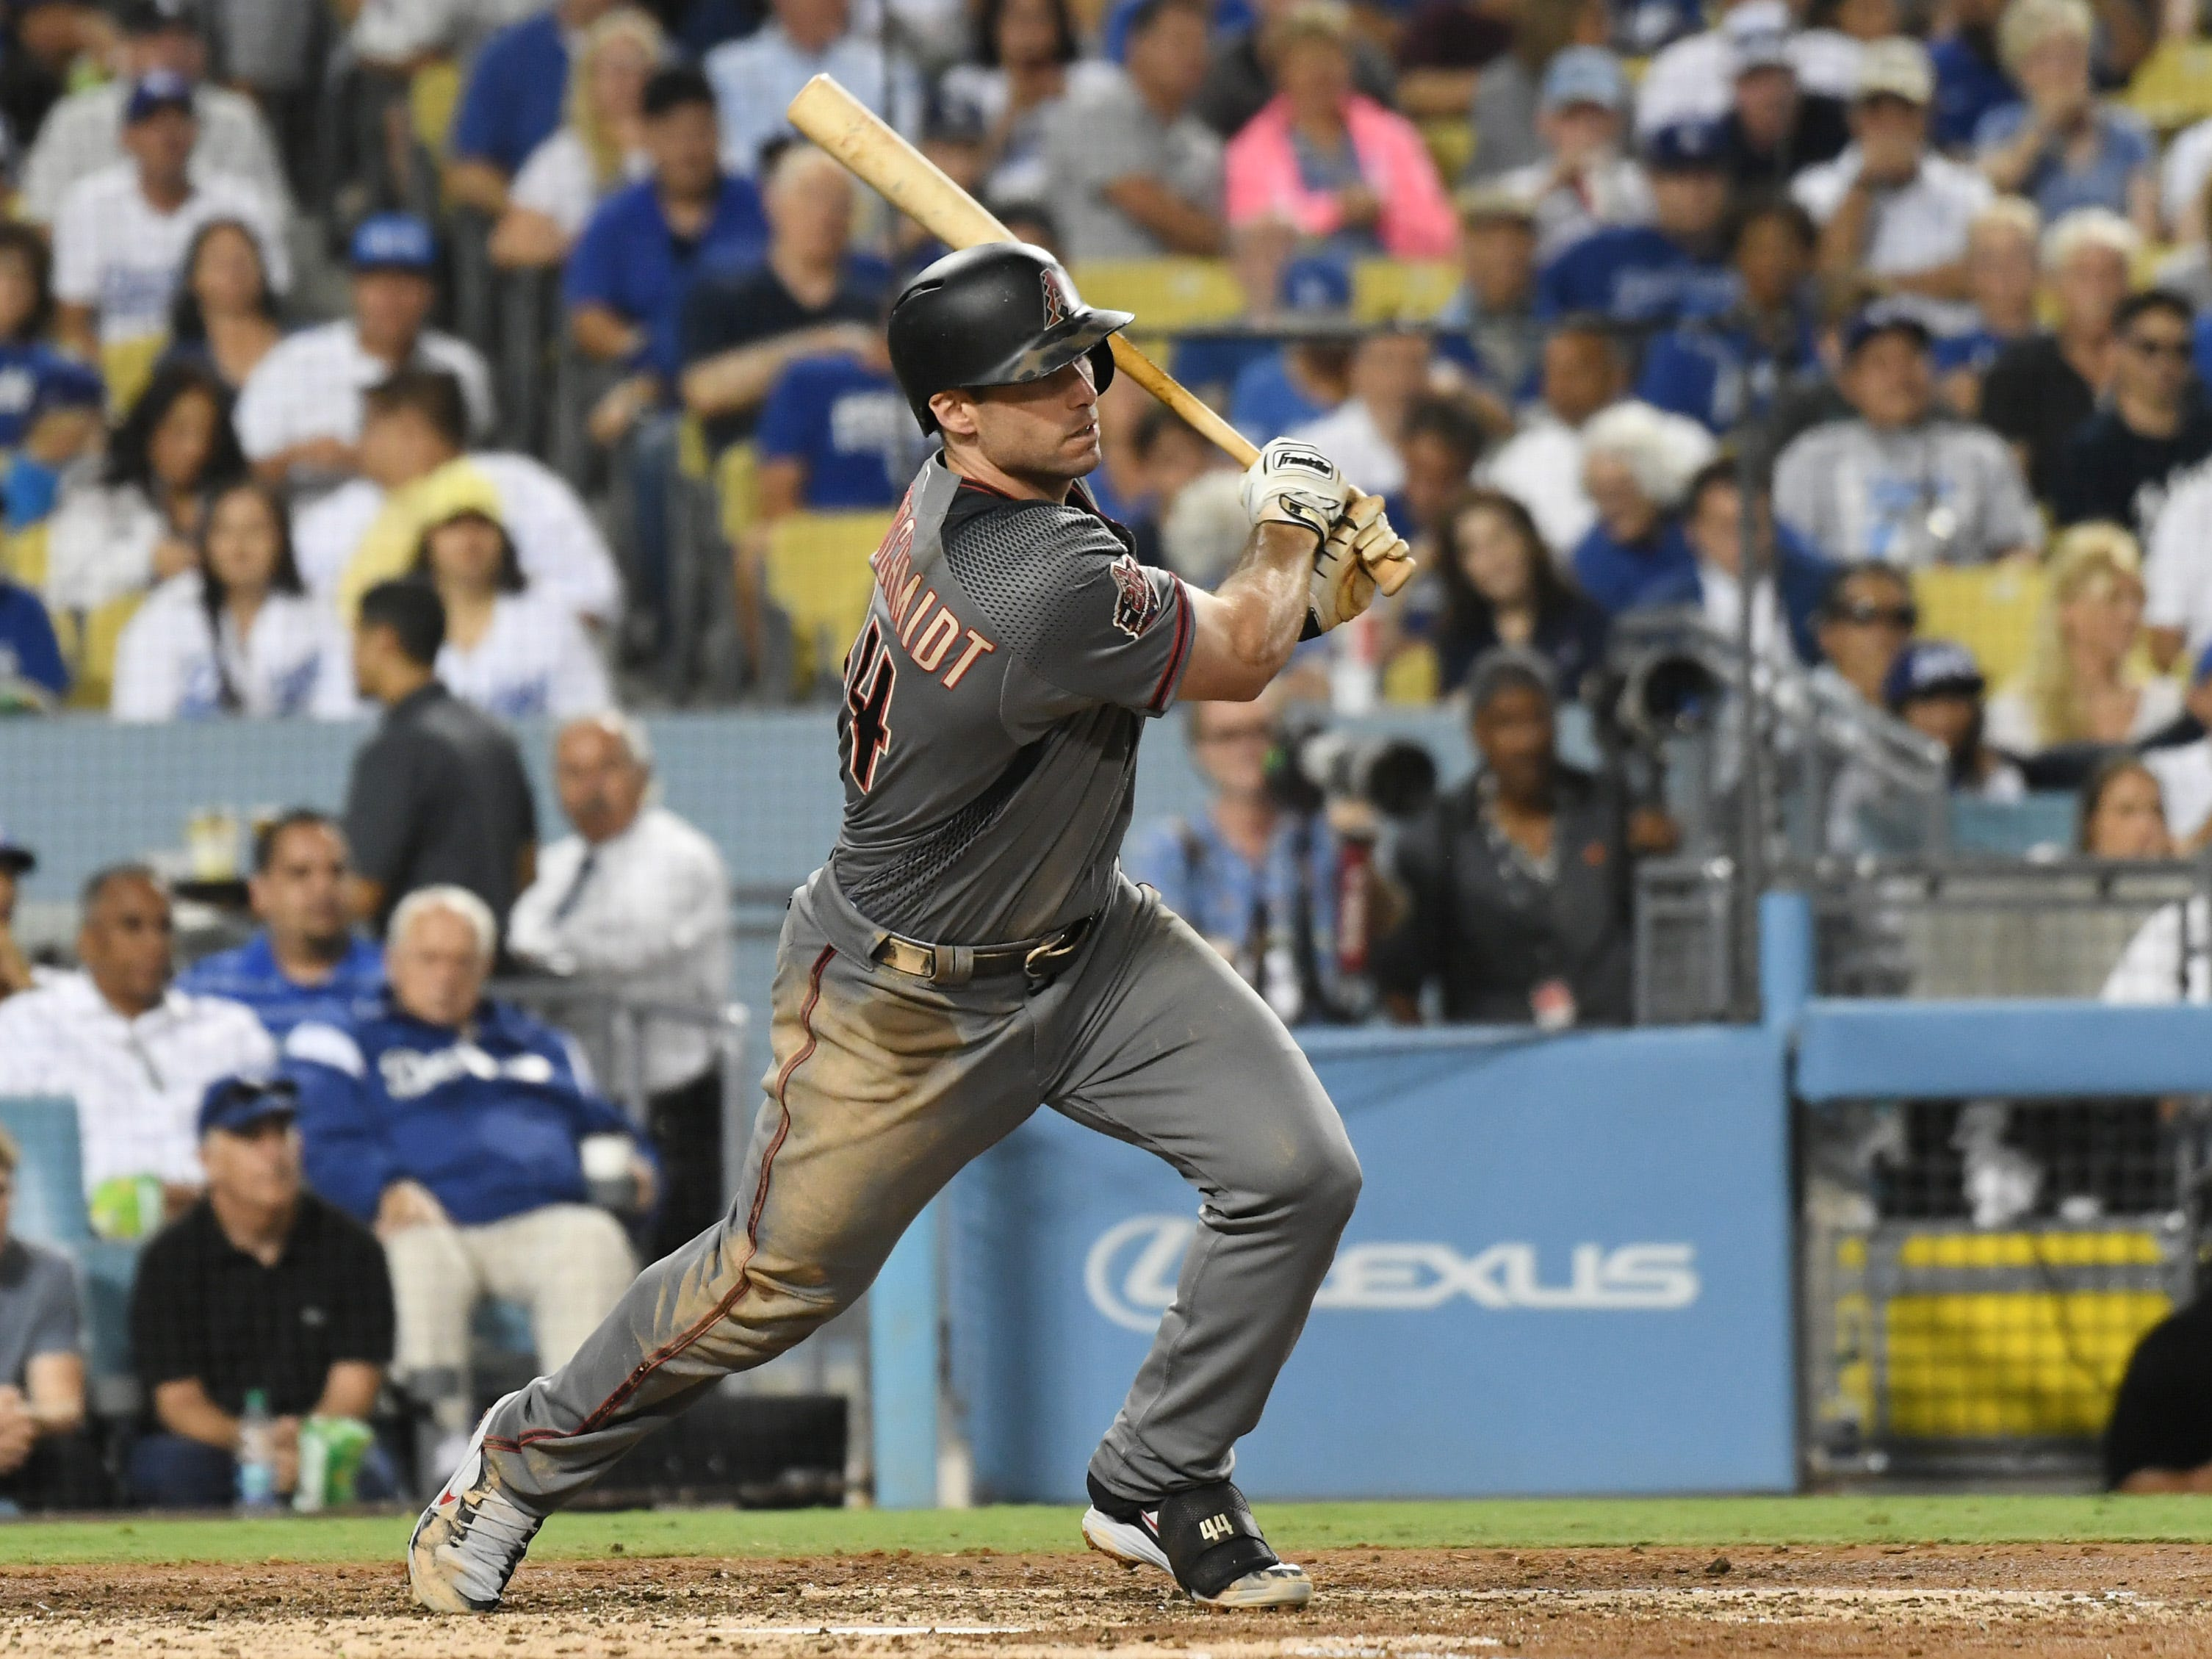 Aug 30, 2018; Los Angeles, CA, USA; Arizona Diamondbacks first baseman Paul Goldschmidt (44) hits a single against the Los Angeles Dodgers in the third inning at Dodger Stadium. Mandatory Credit: Richard Mackson-USA TODAY Sports